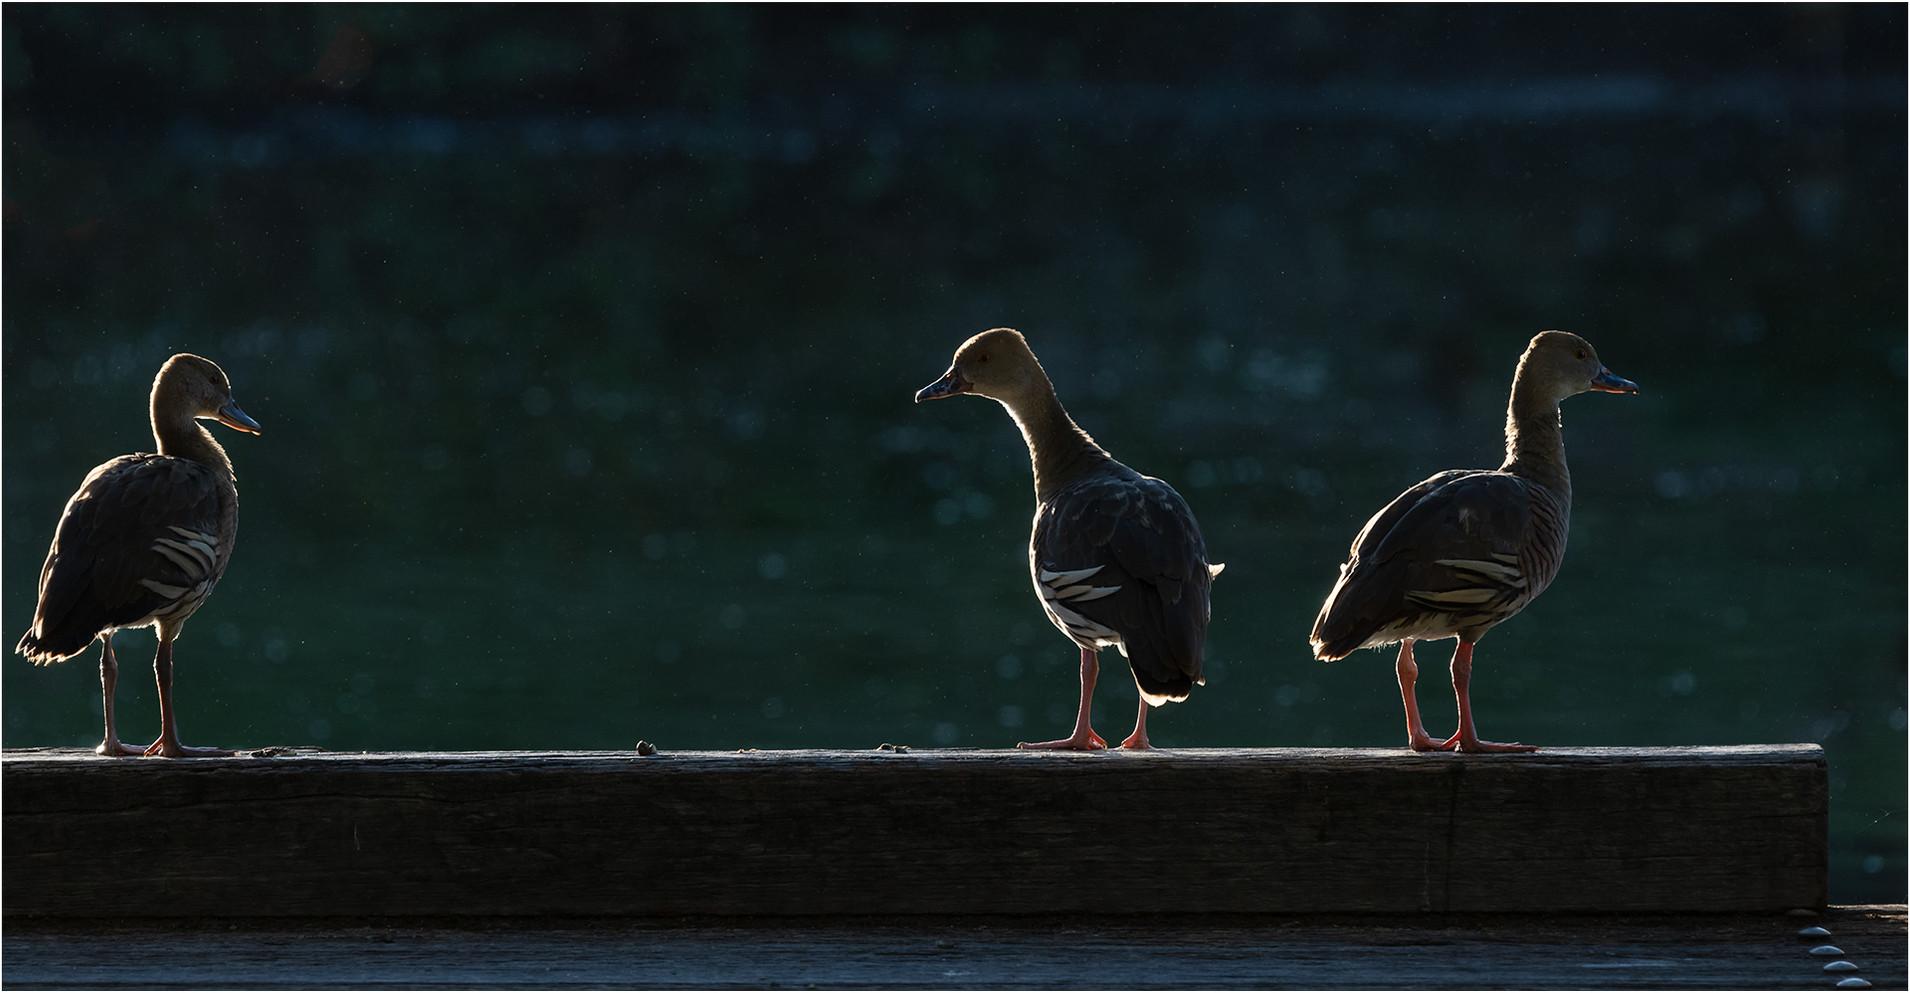 Three Ducks